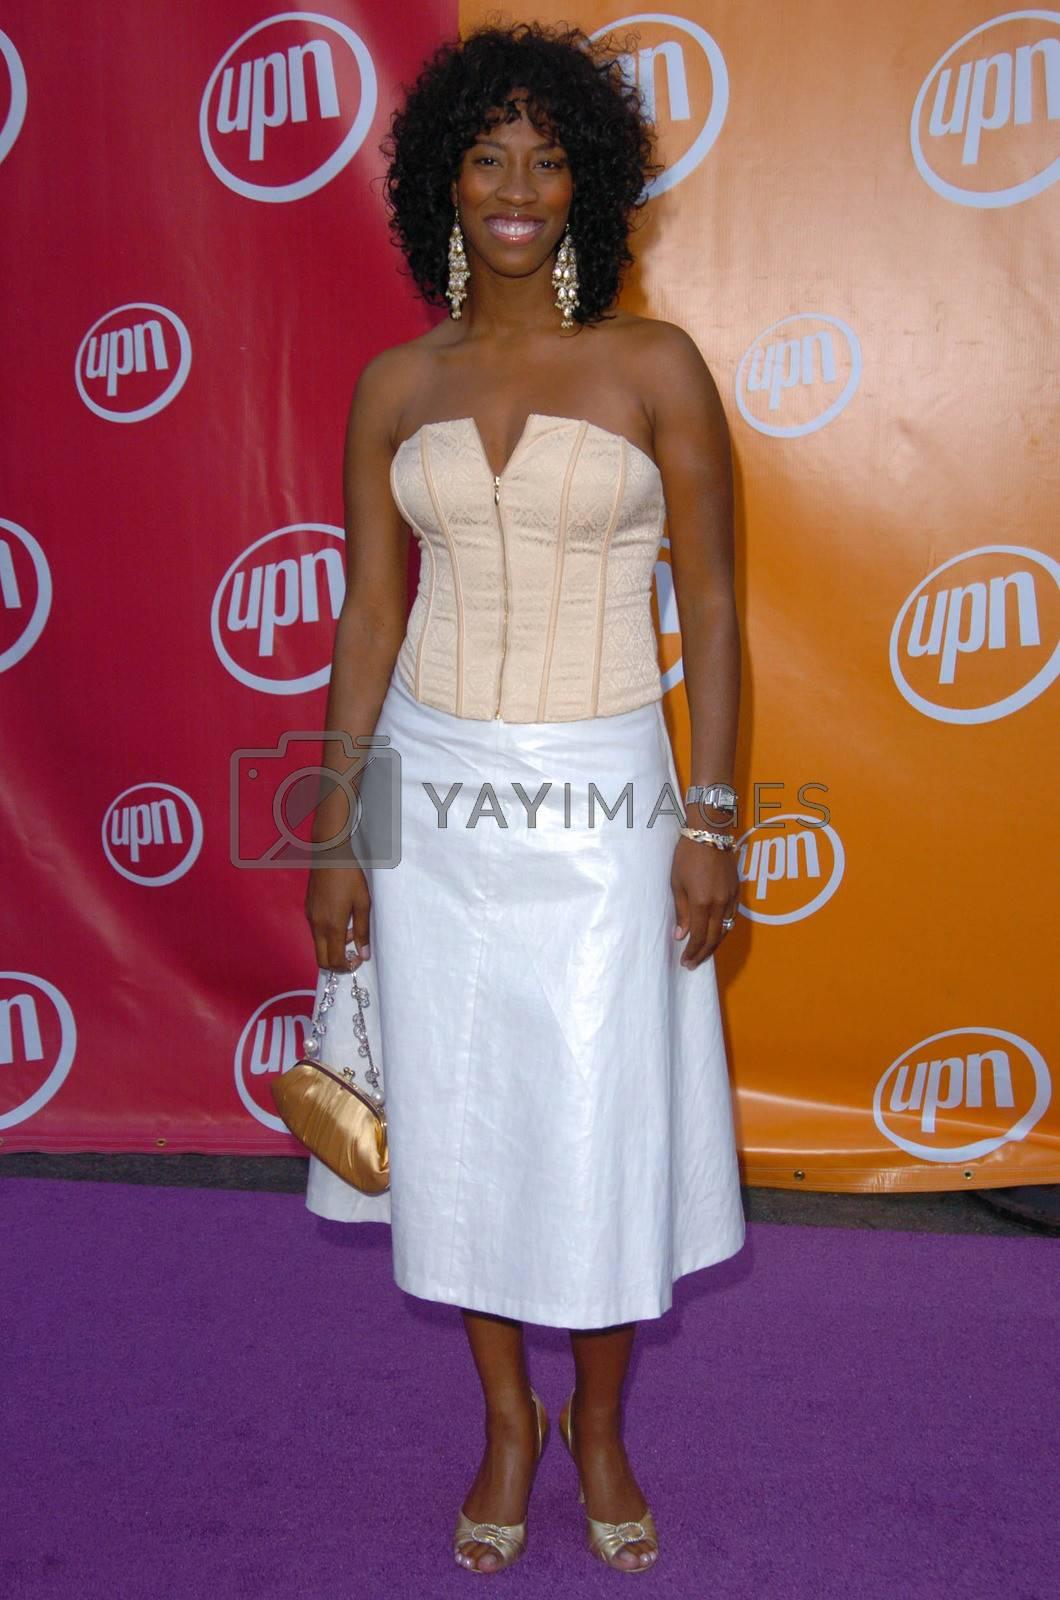 Shondrella Avery At the UPN Summer TCA Party, Paramount Studios, Hollywood, CA 07-21-05